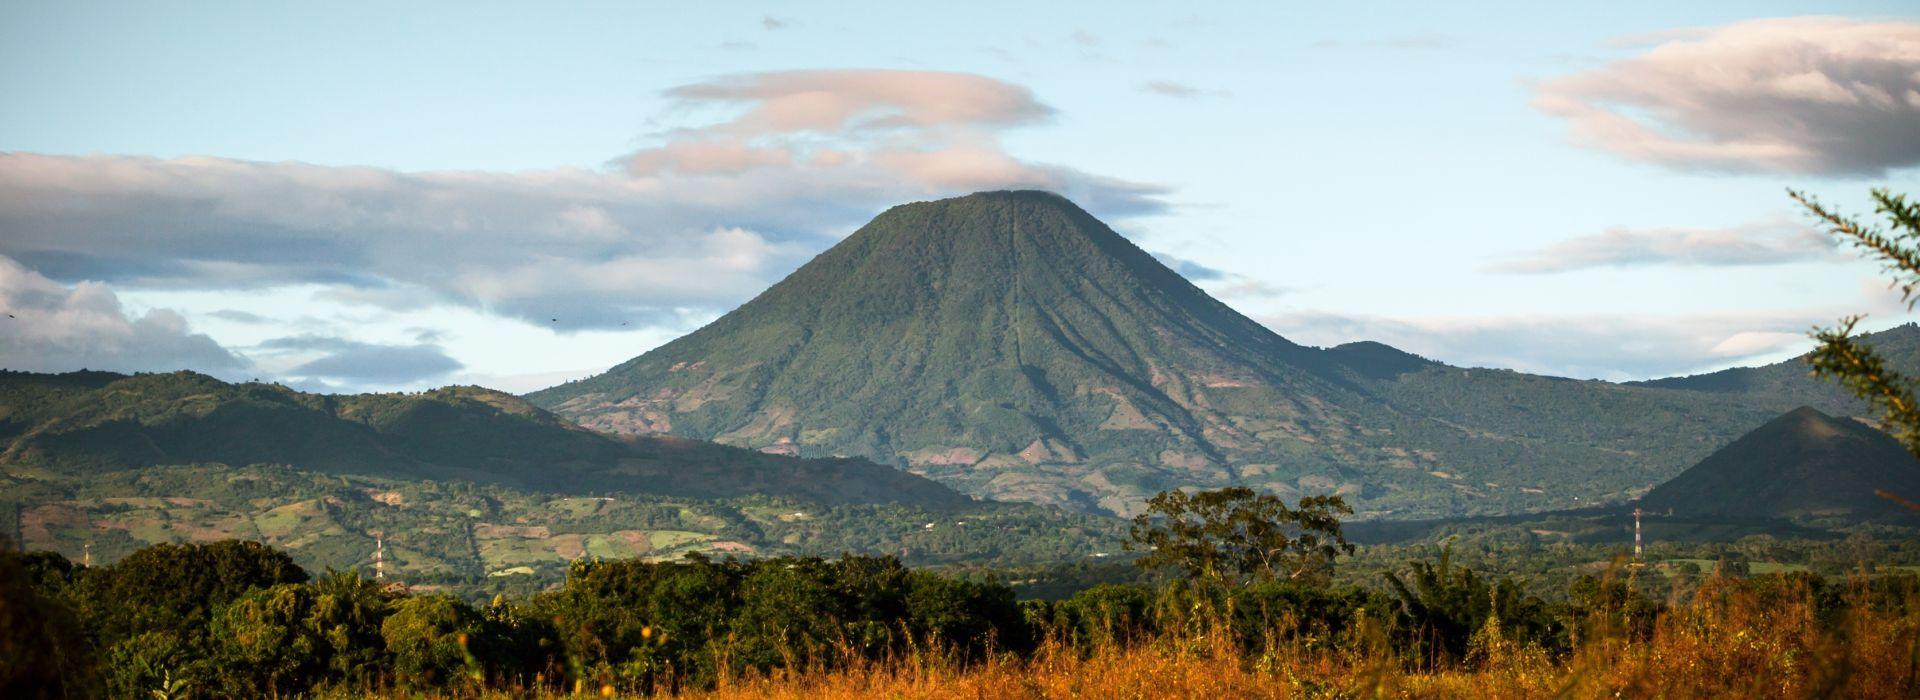 El Salvador Tours and Trips to El Salvador